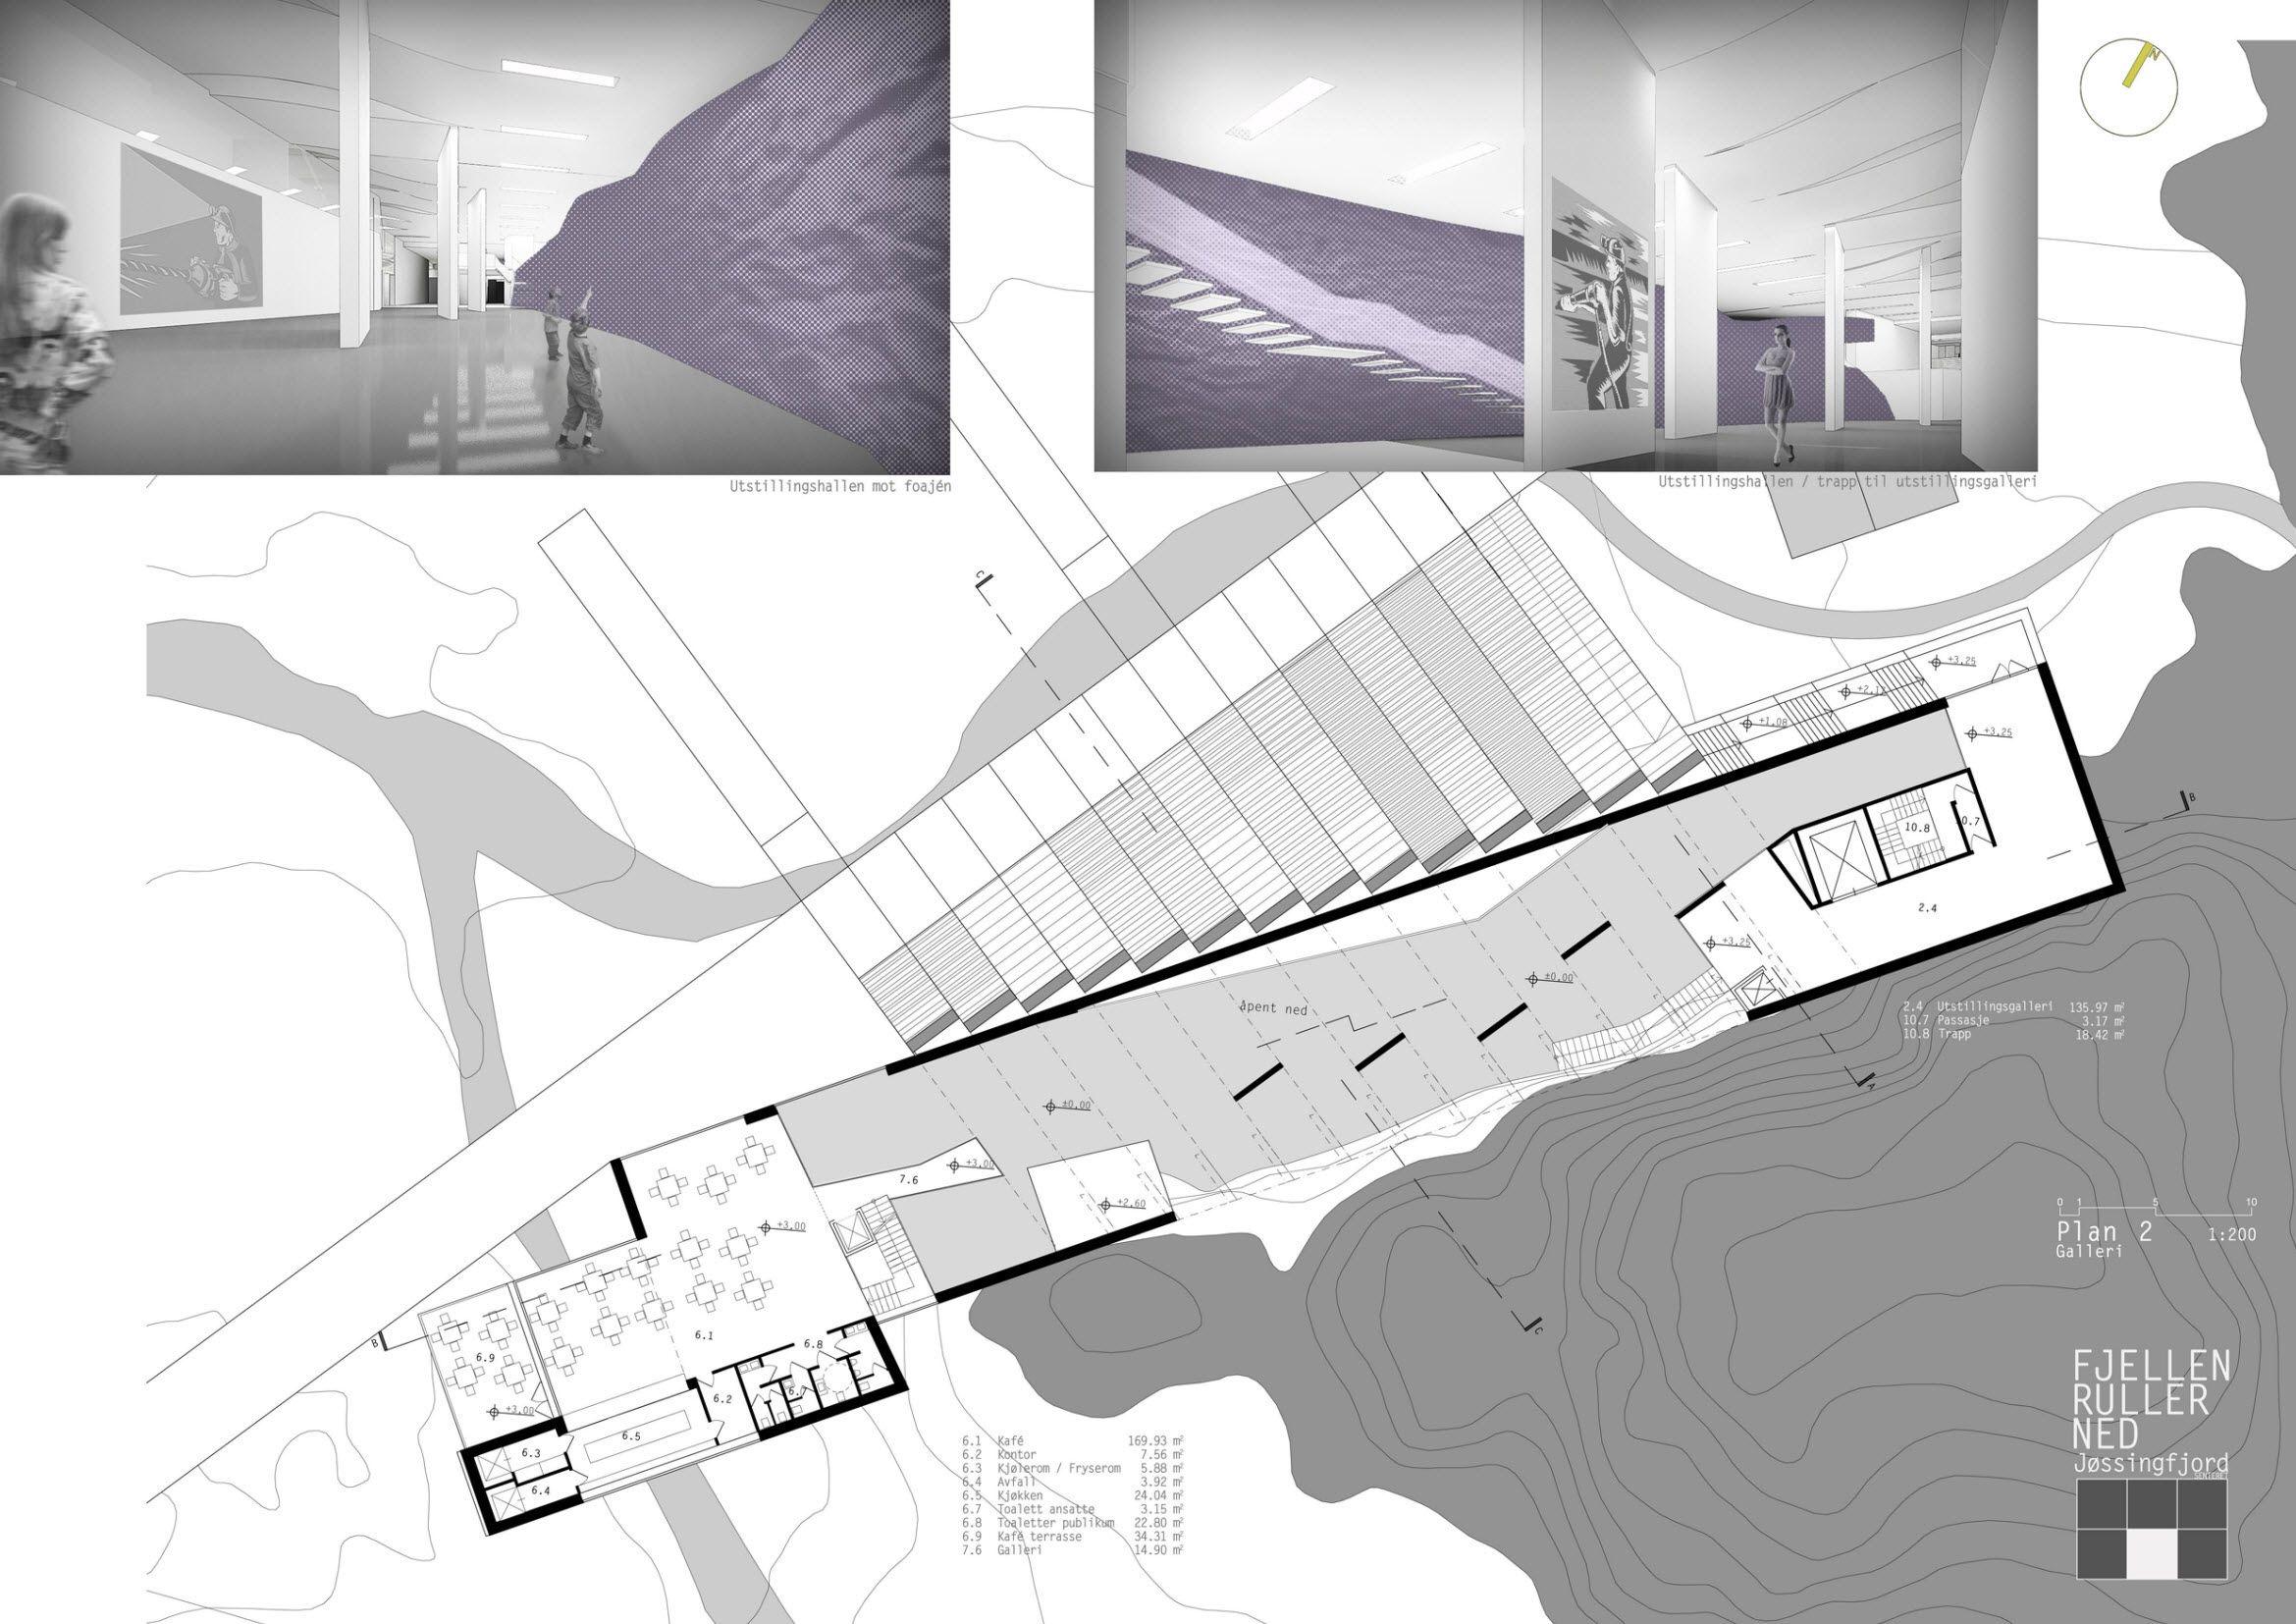 norvég pályázatok building designe